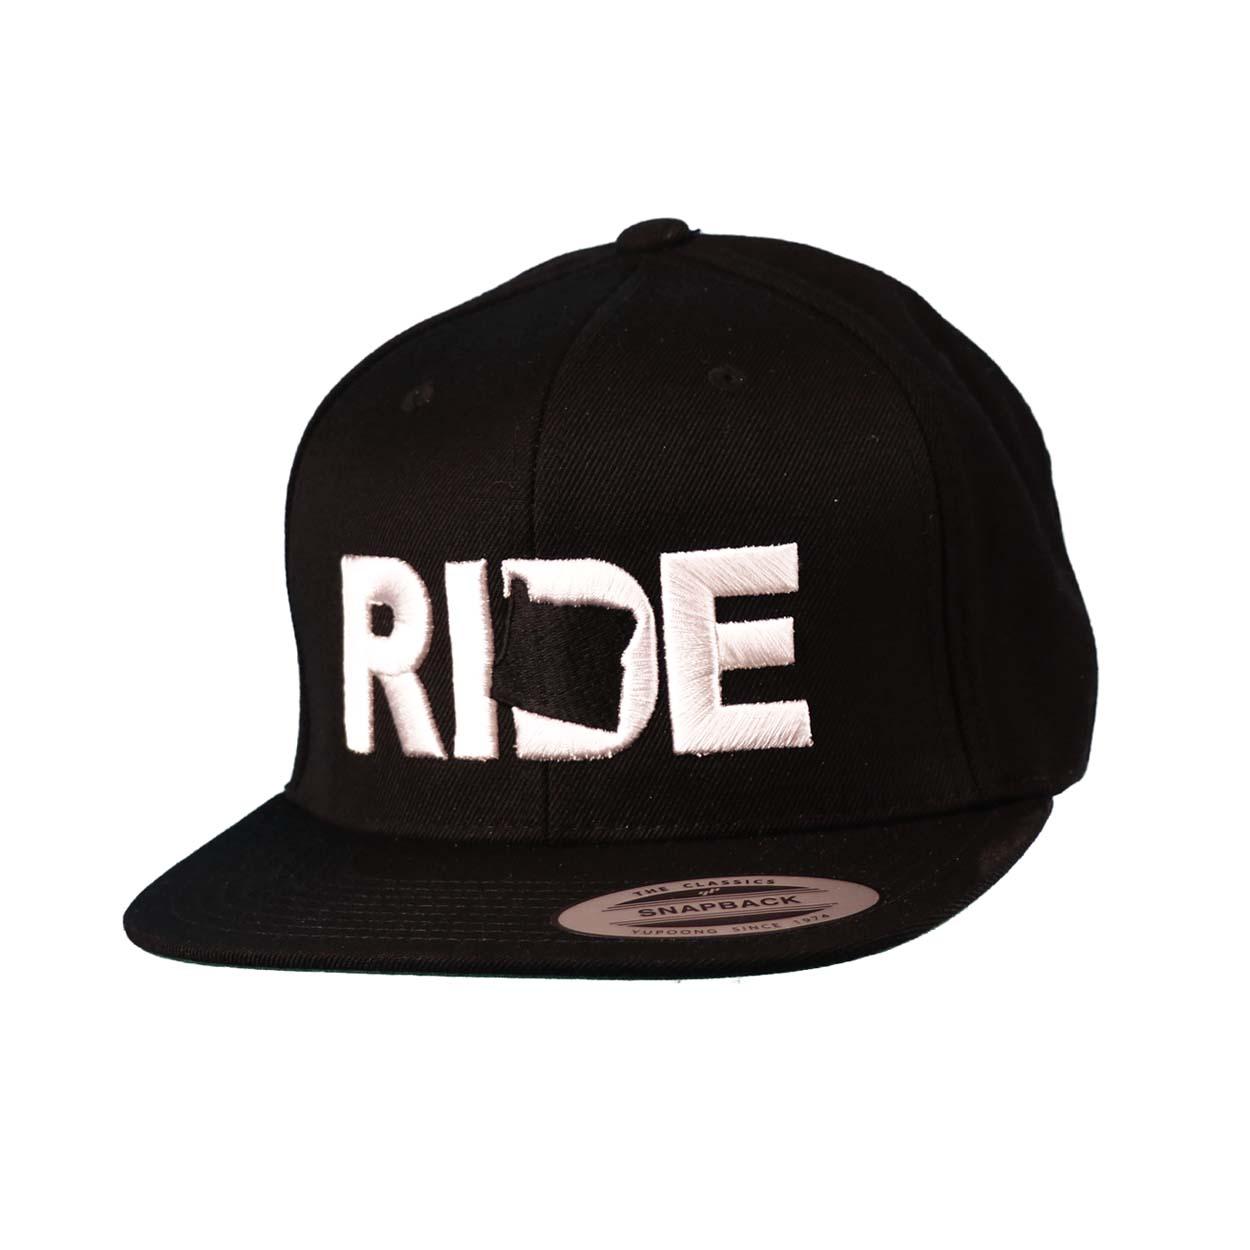 Ride Oregon Classic Embroidered  Snapback Flat Brim Hat Black/White